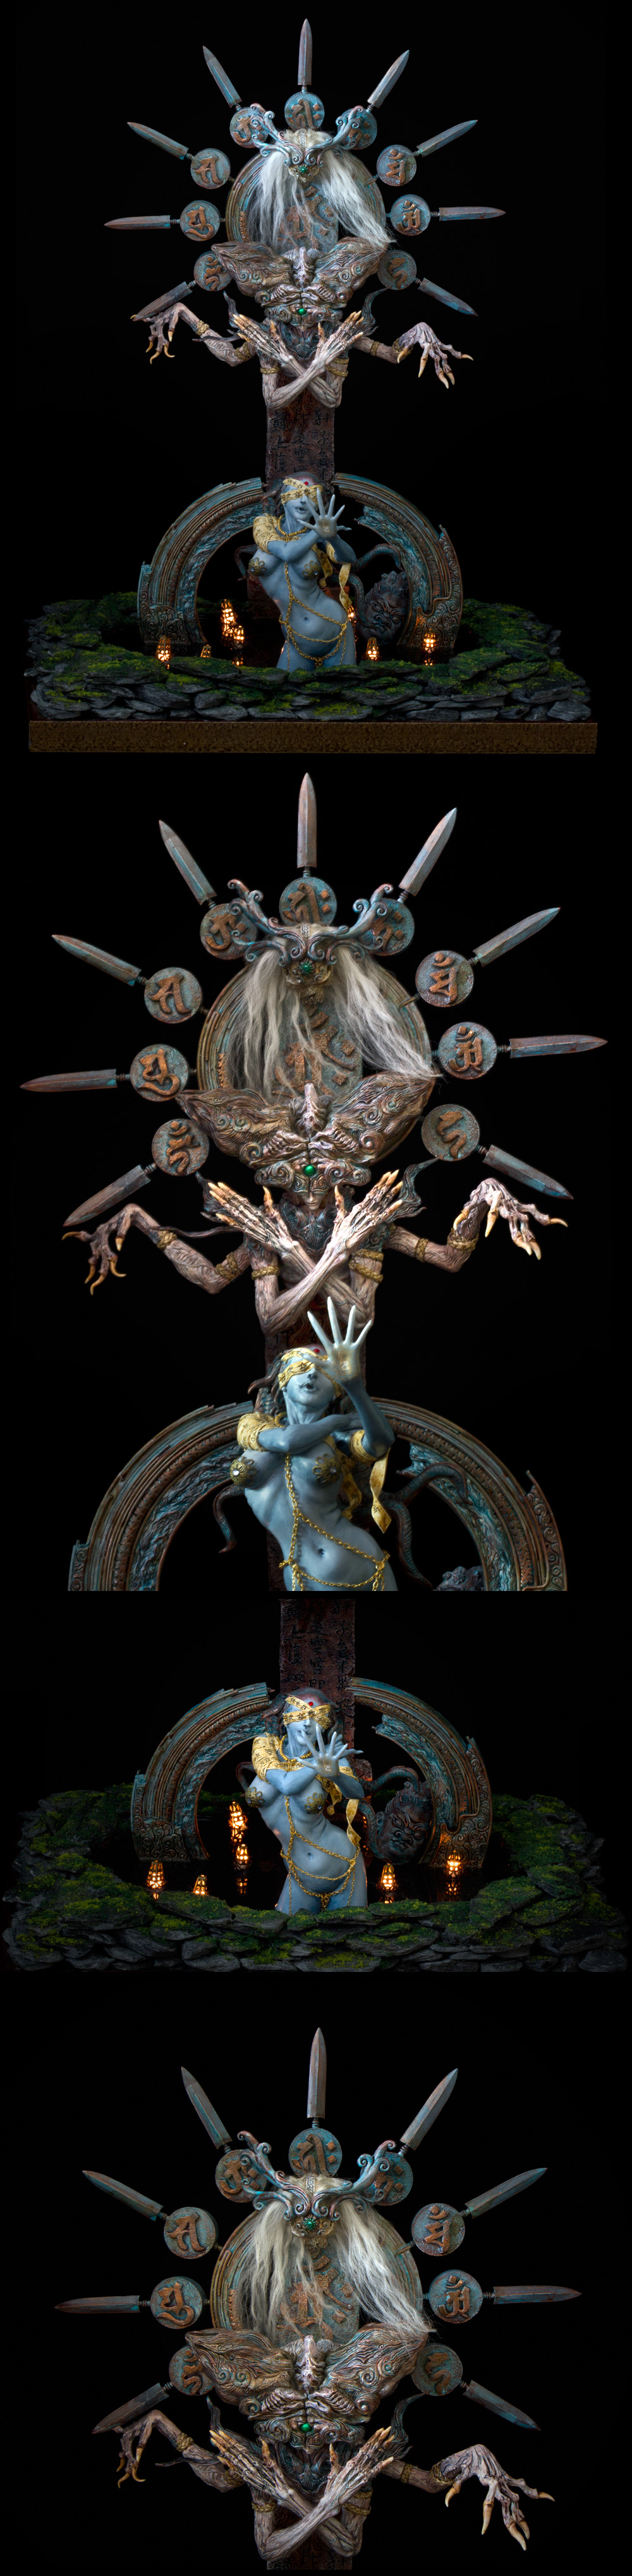 The Night of Lord Shiva